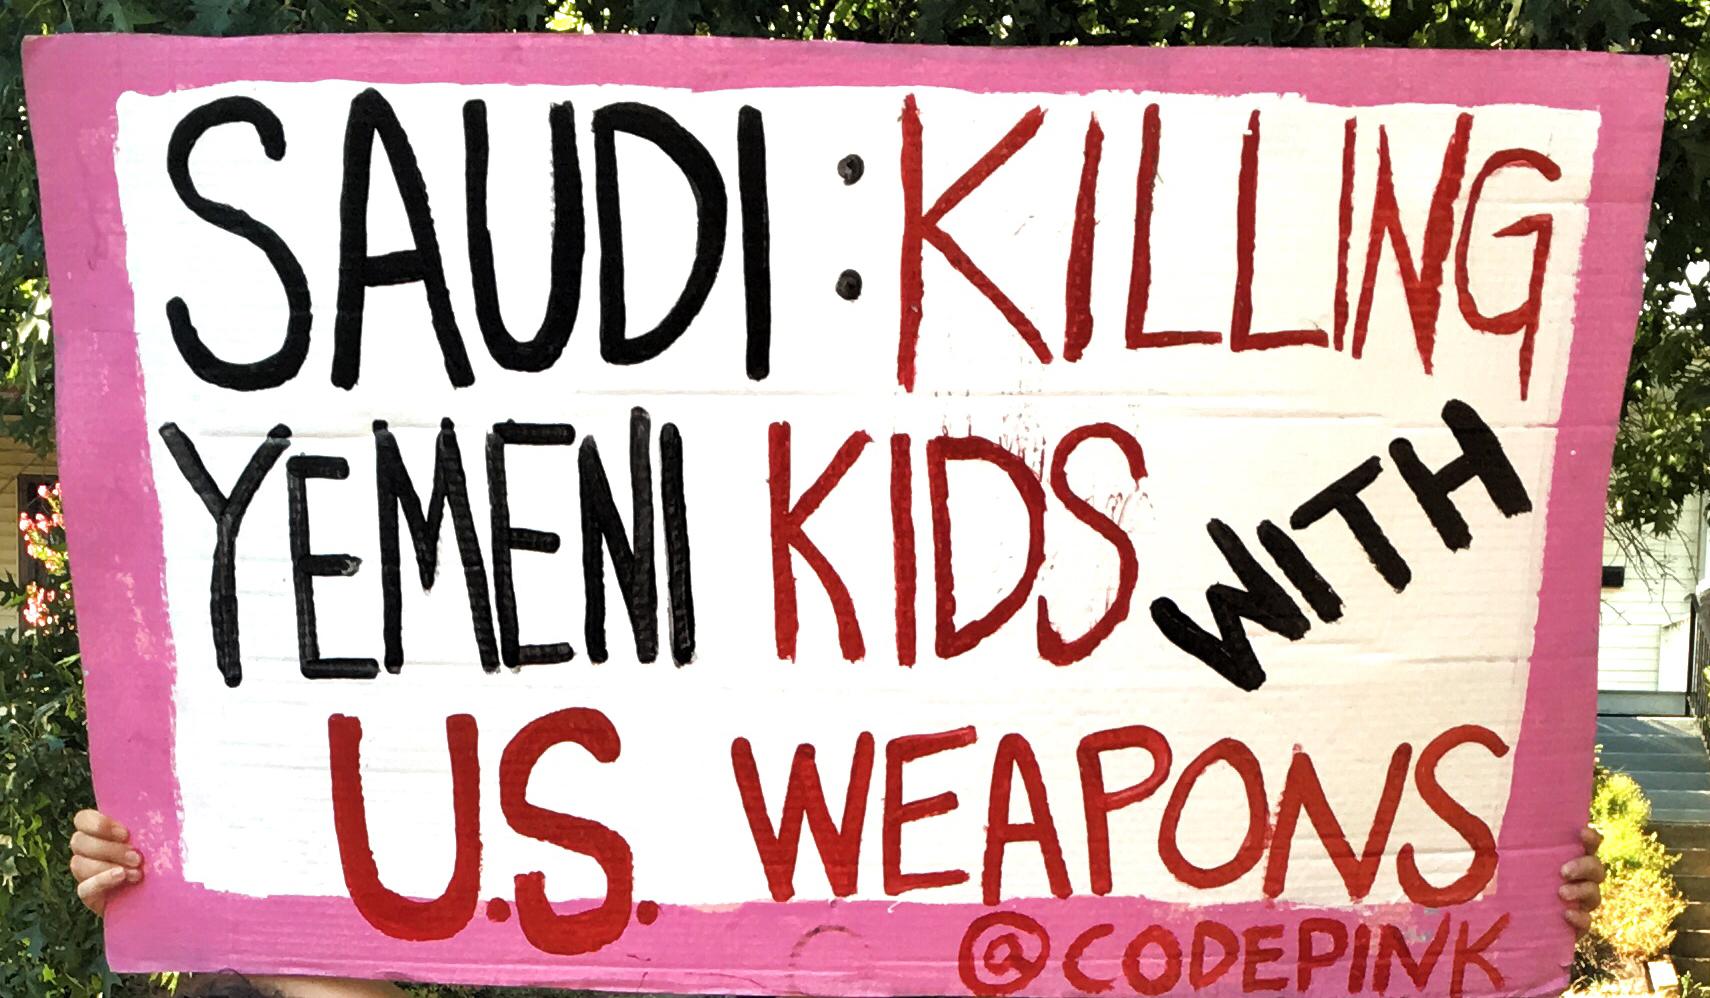 Saudi-killings3.jpg